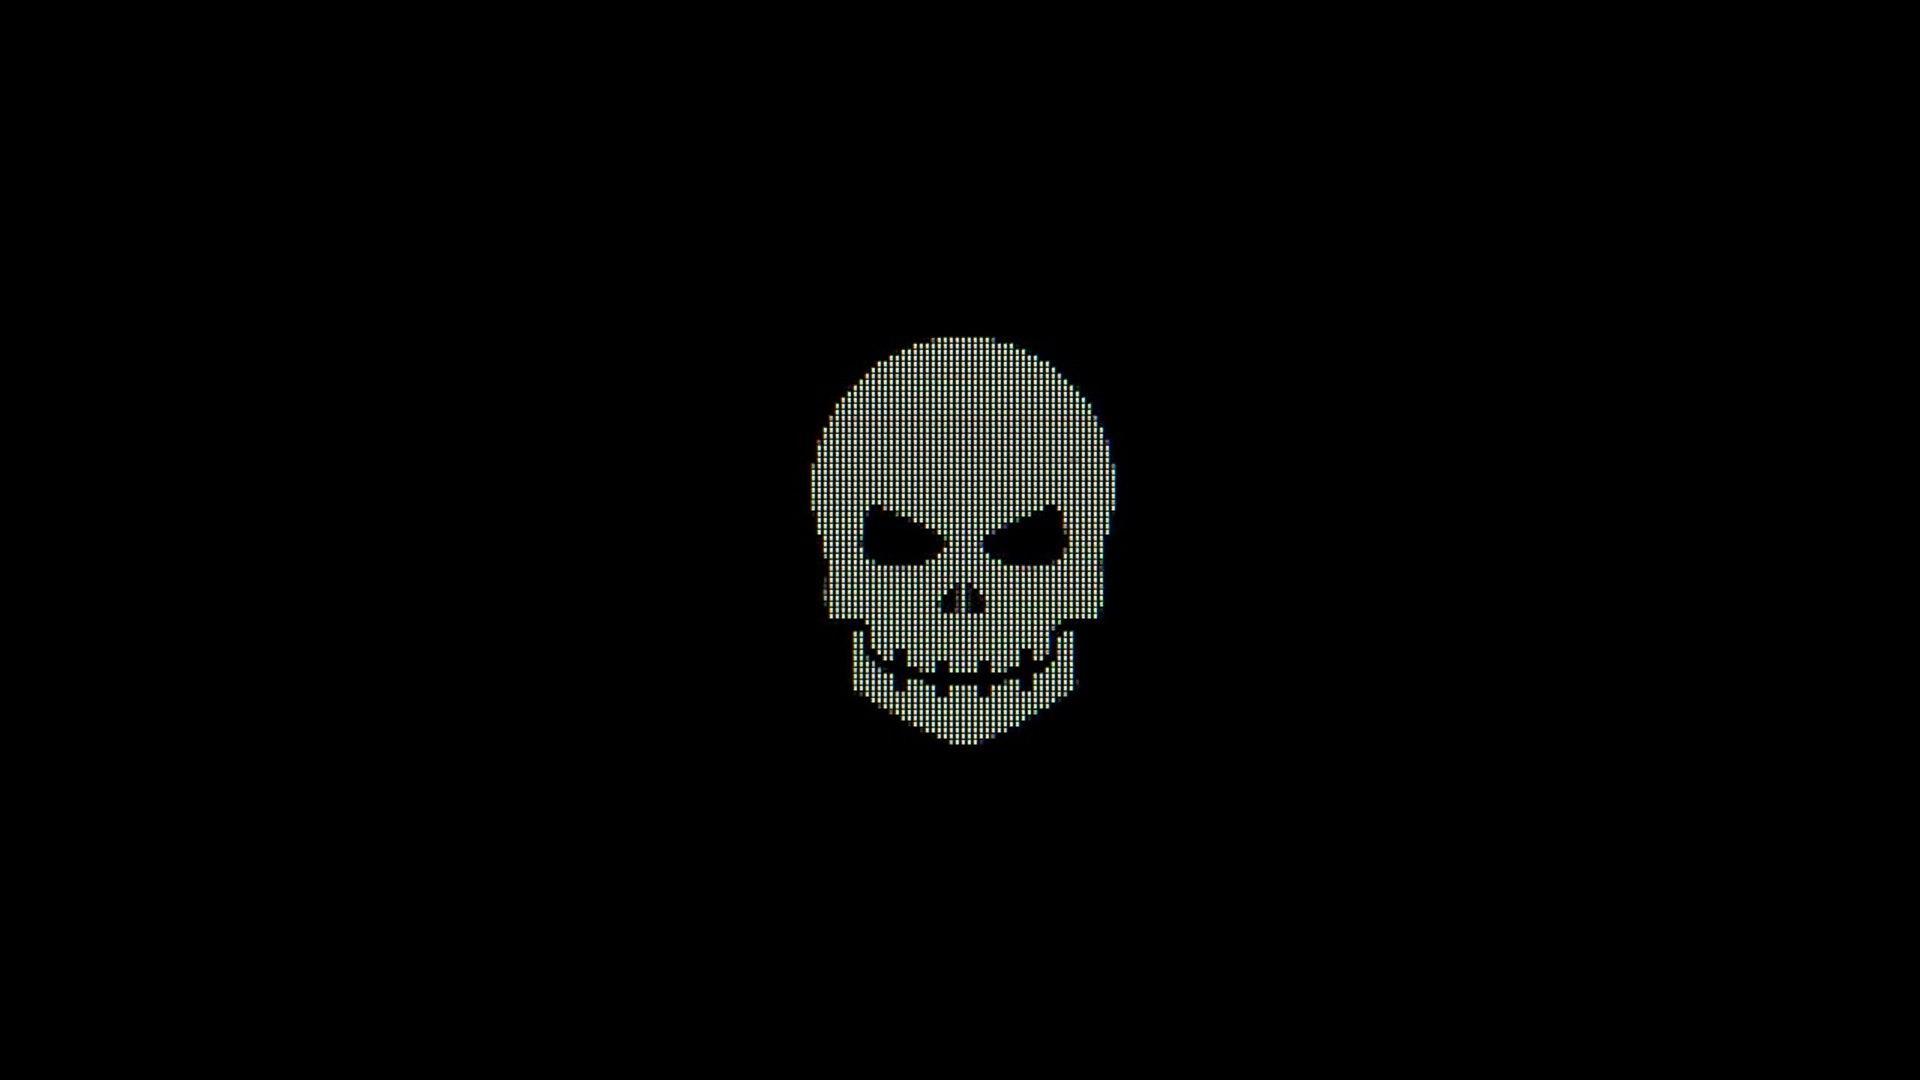 Black Background Skull Minimalism Monochrome 1920x1080